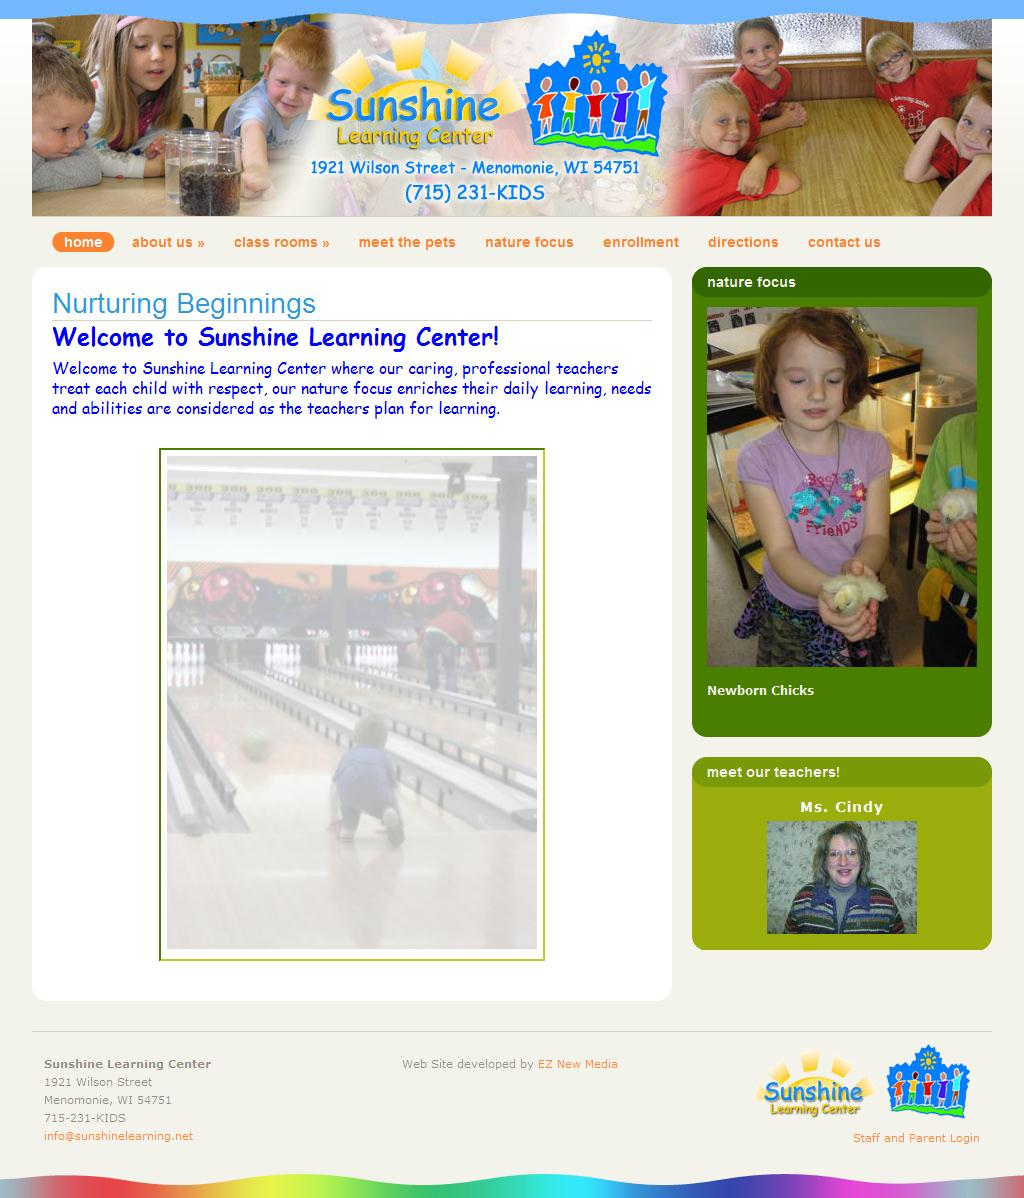 Nurturing Beginnings | Sunshine Learning Center